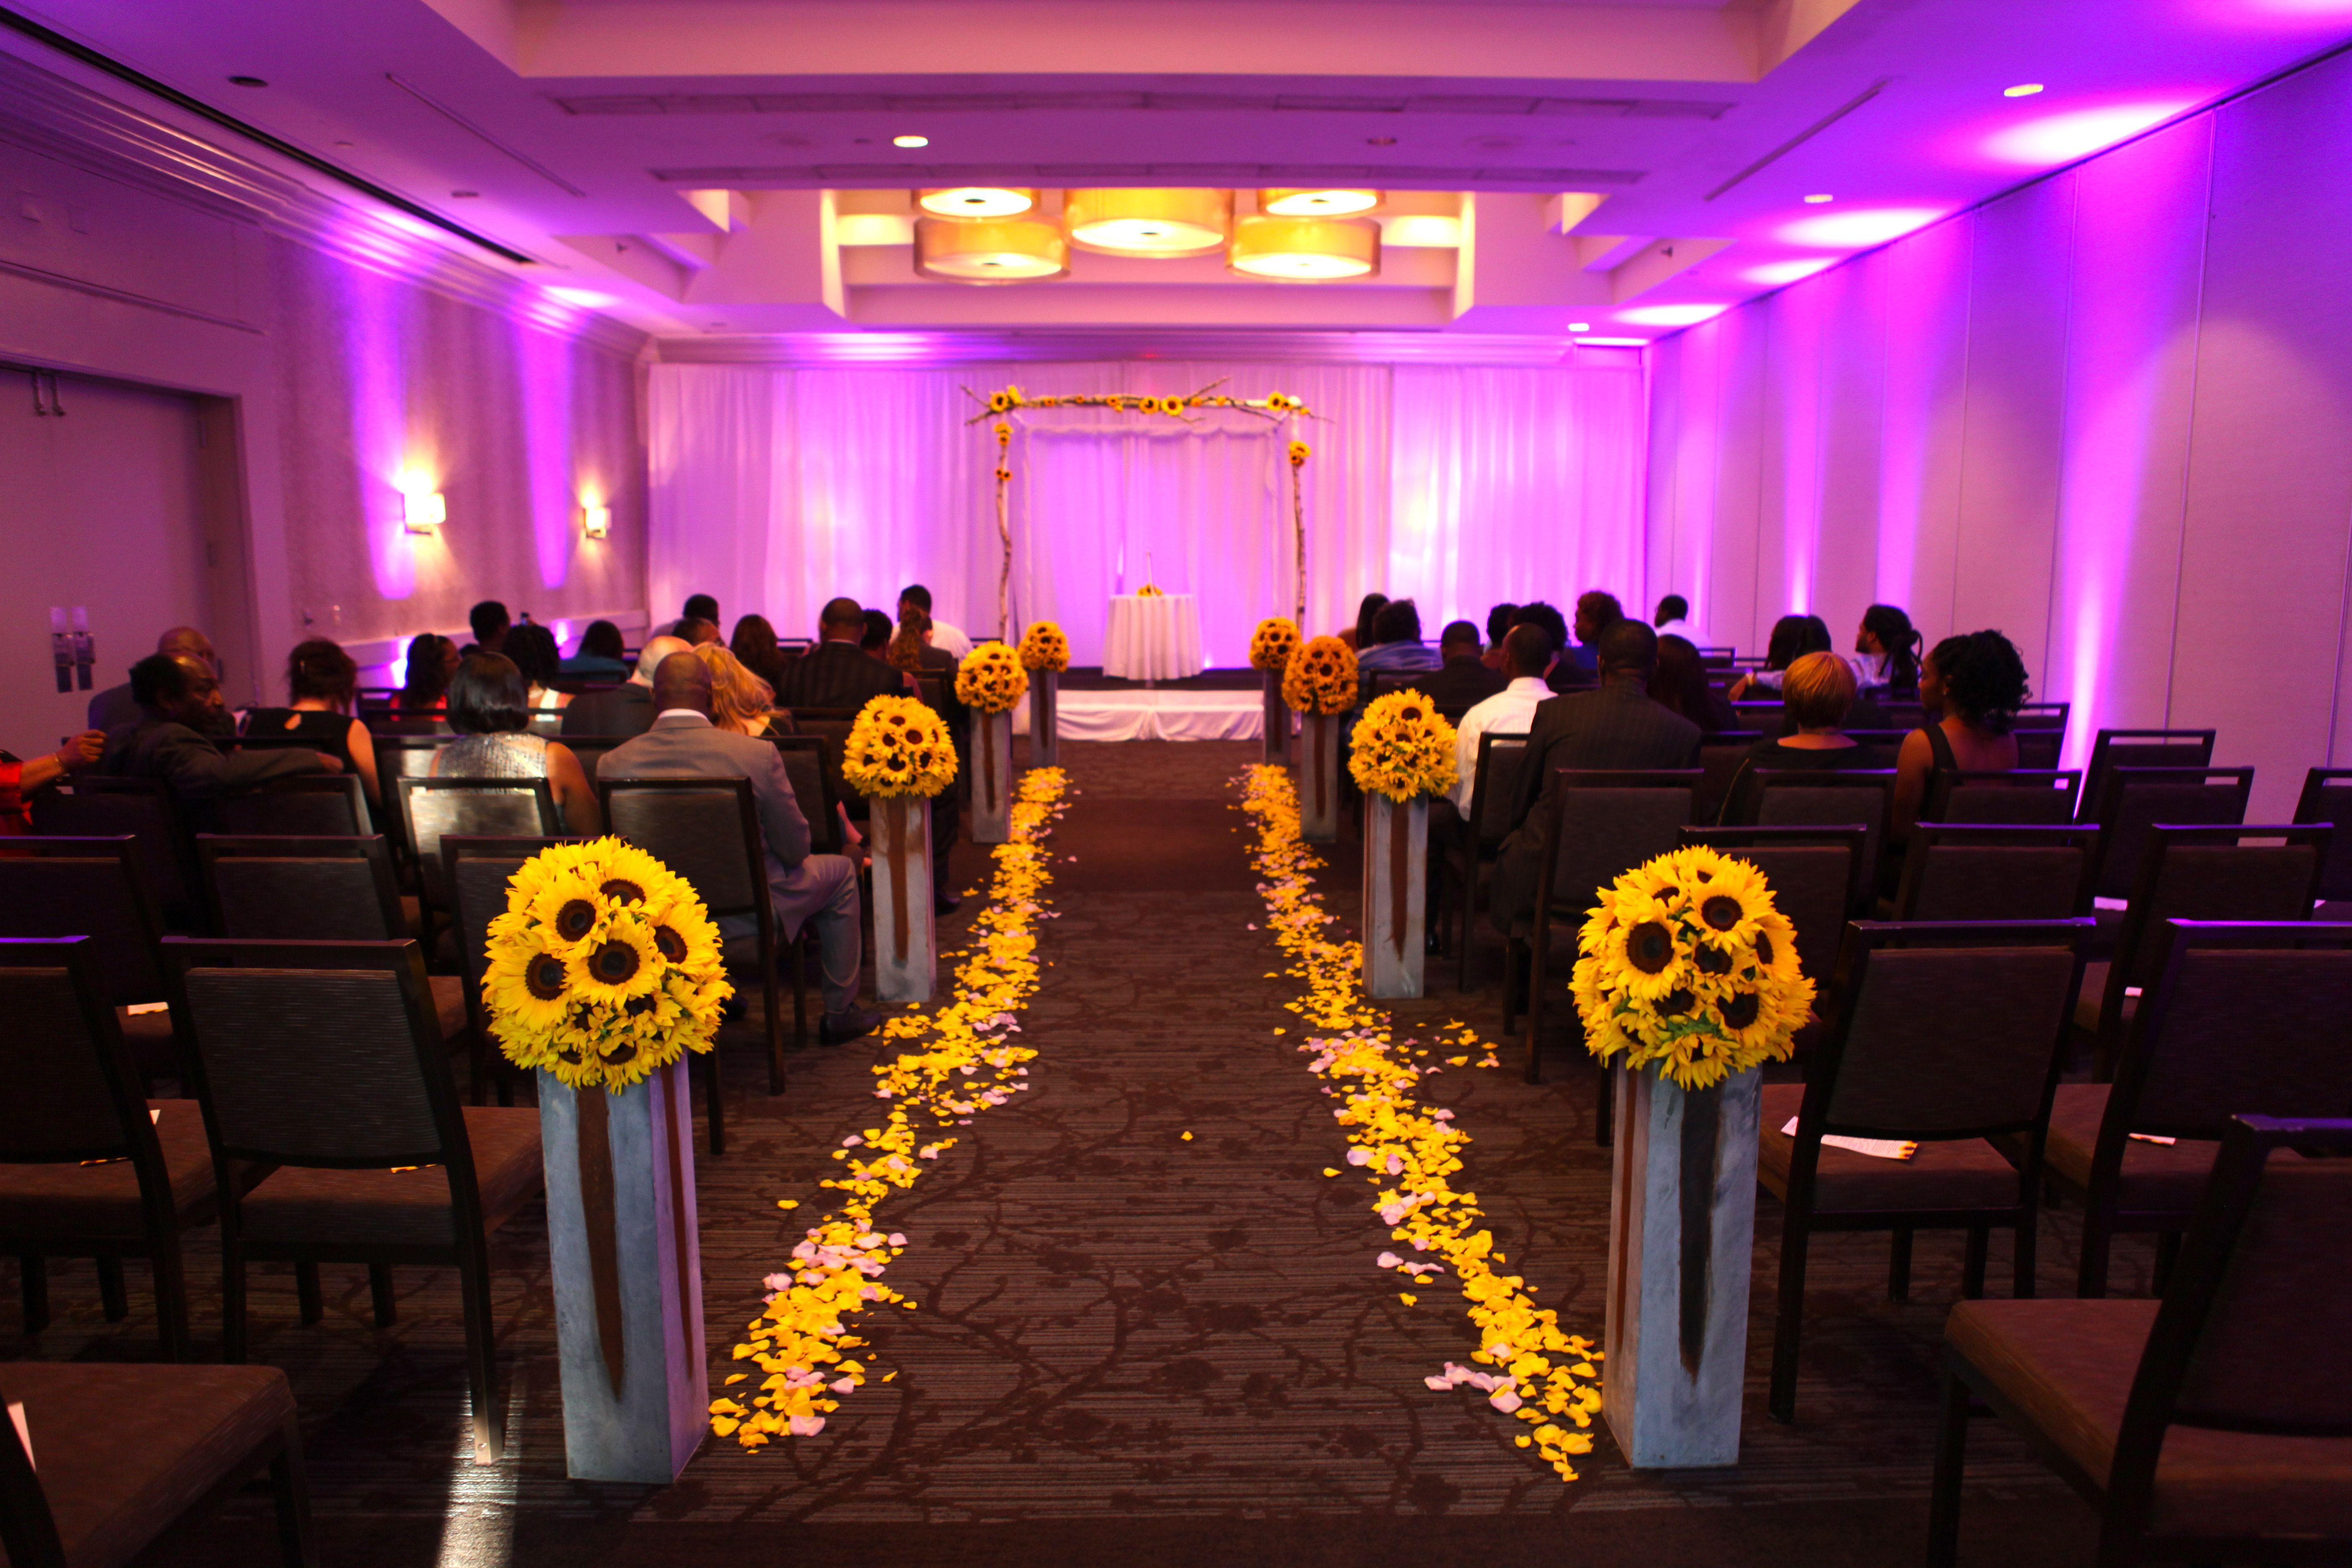 sunflower wedding, purple uplighting, ever after floral designs ...